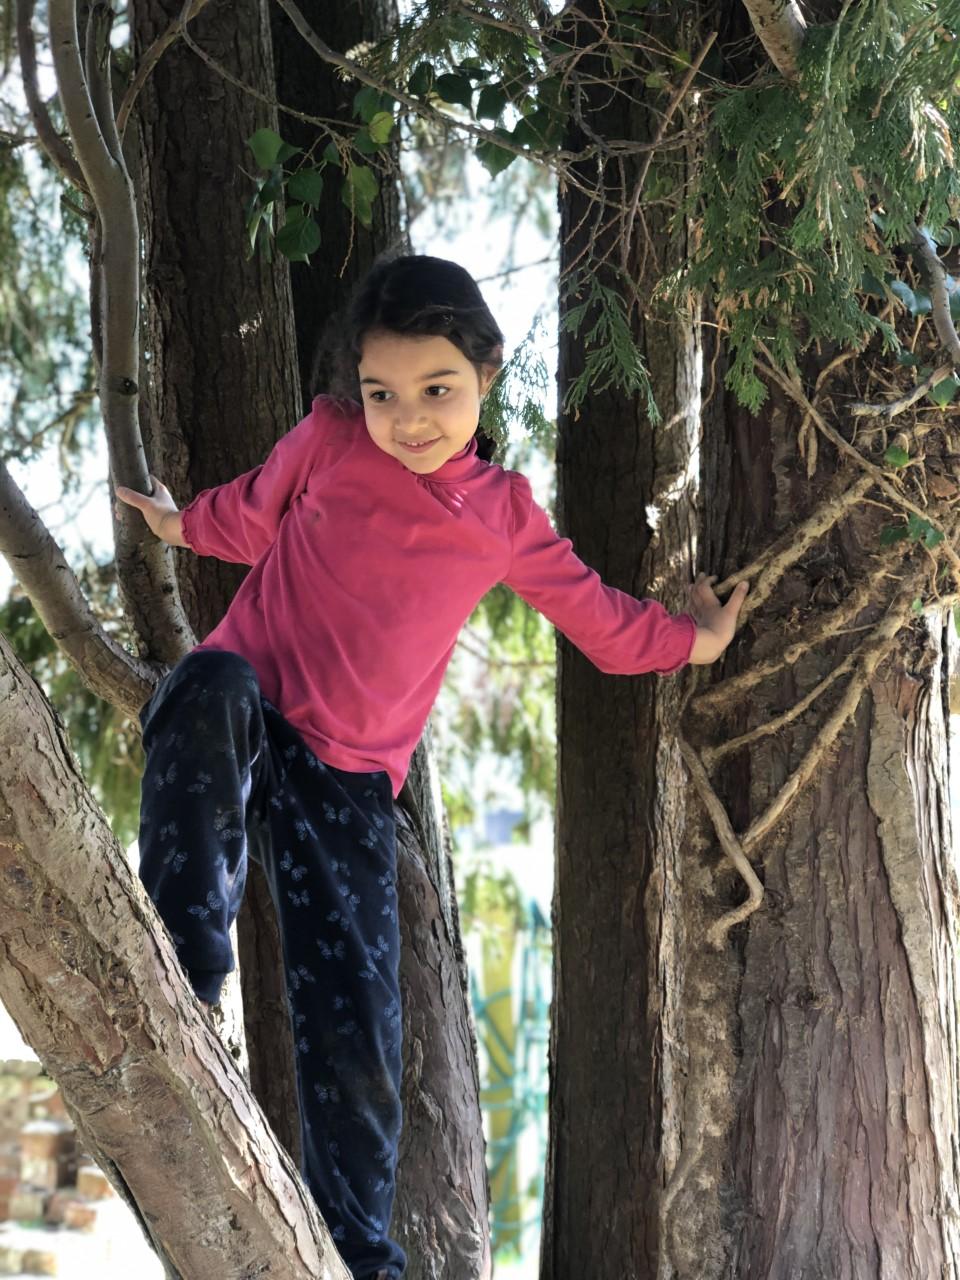 wycliffe girl climbing a tree in Manor Farm